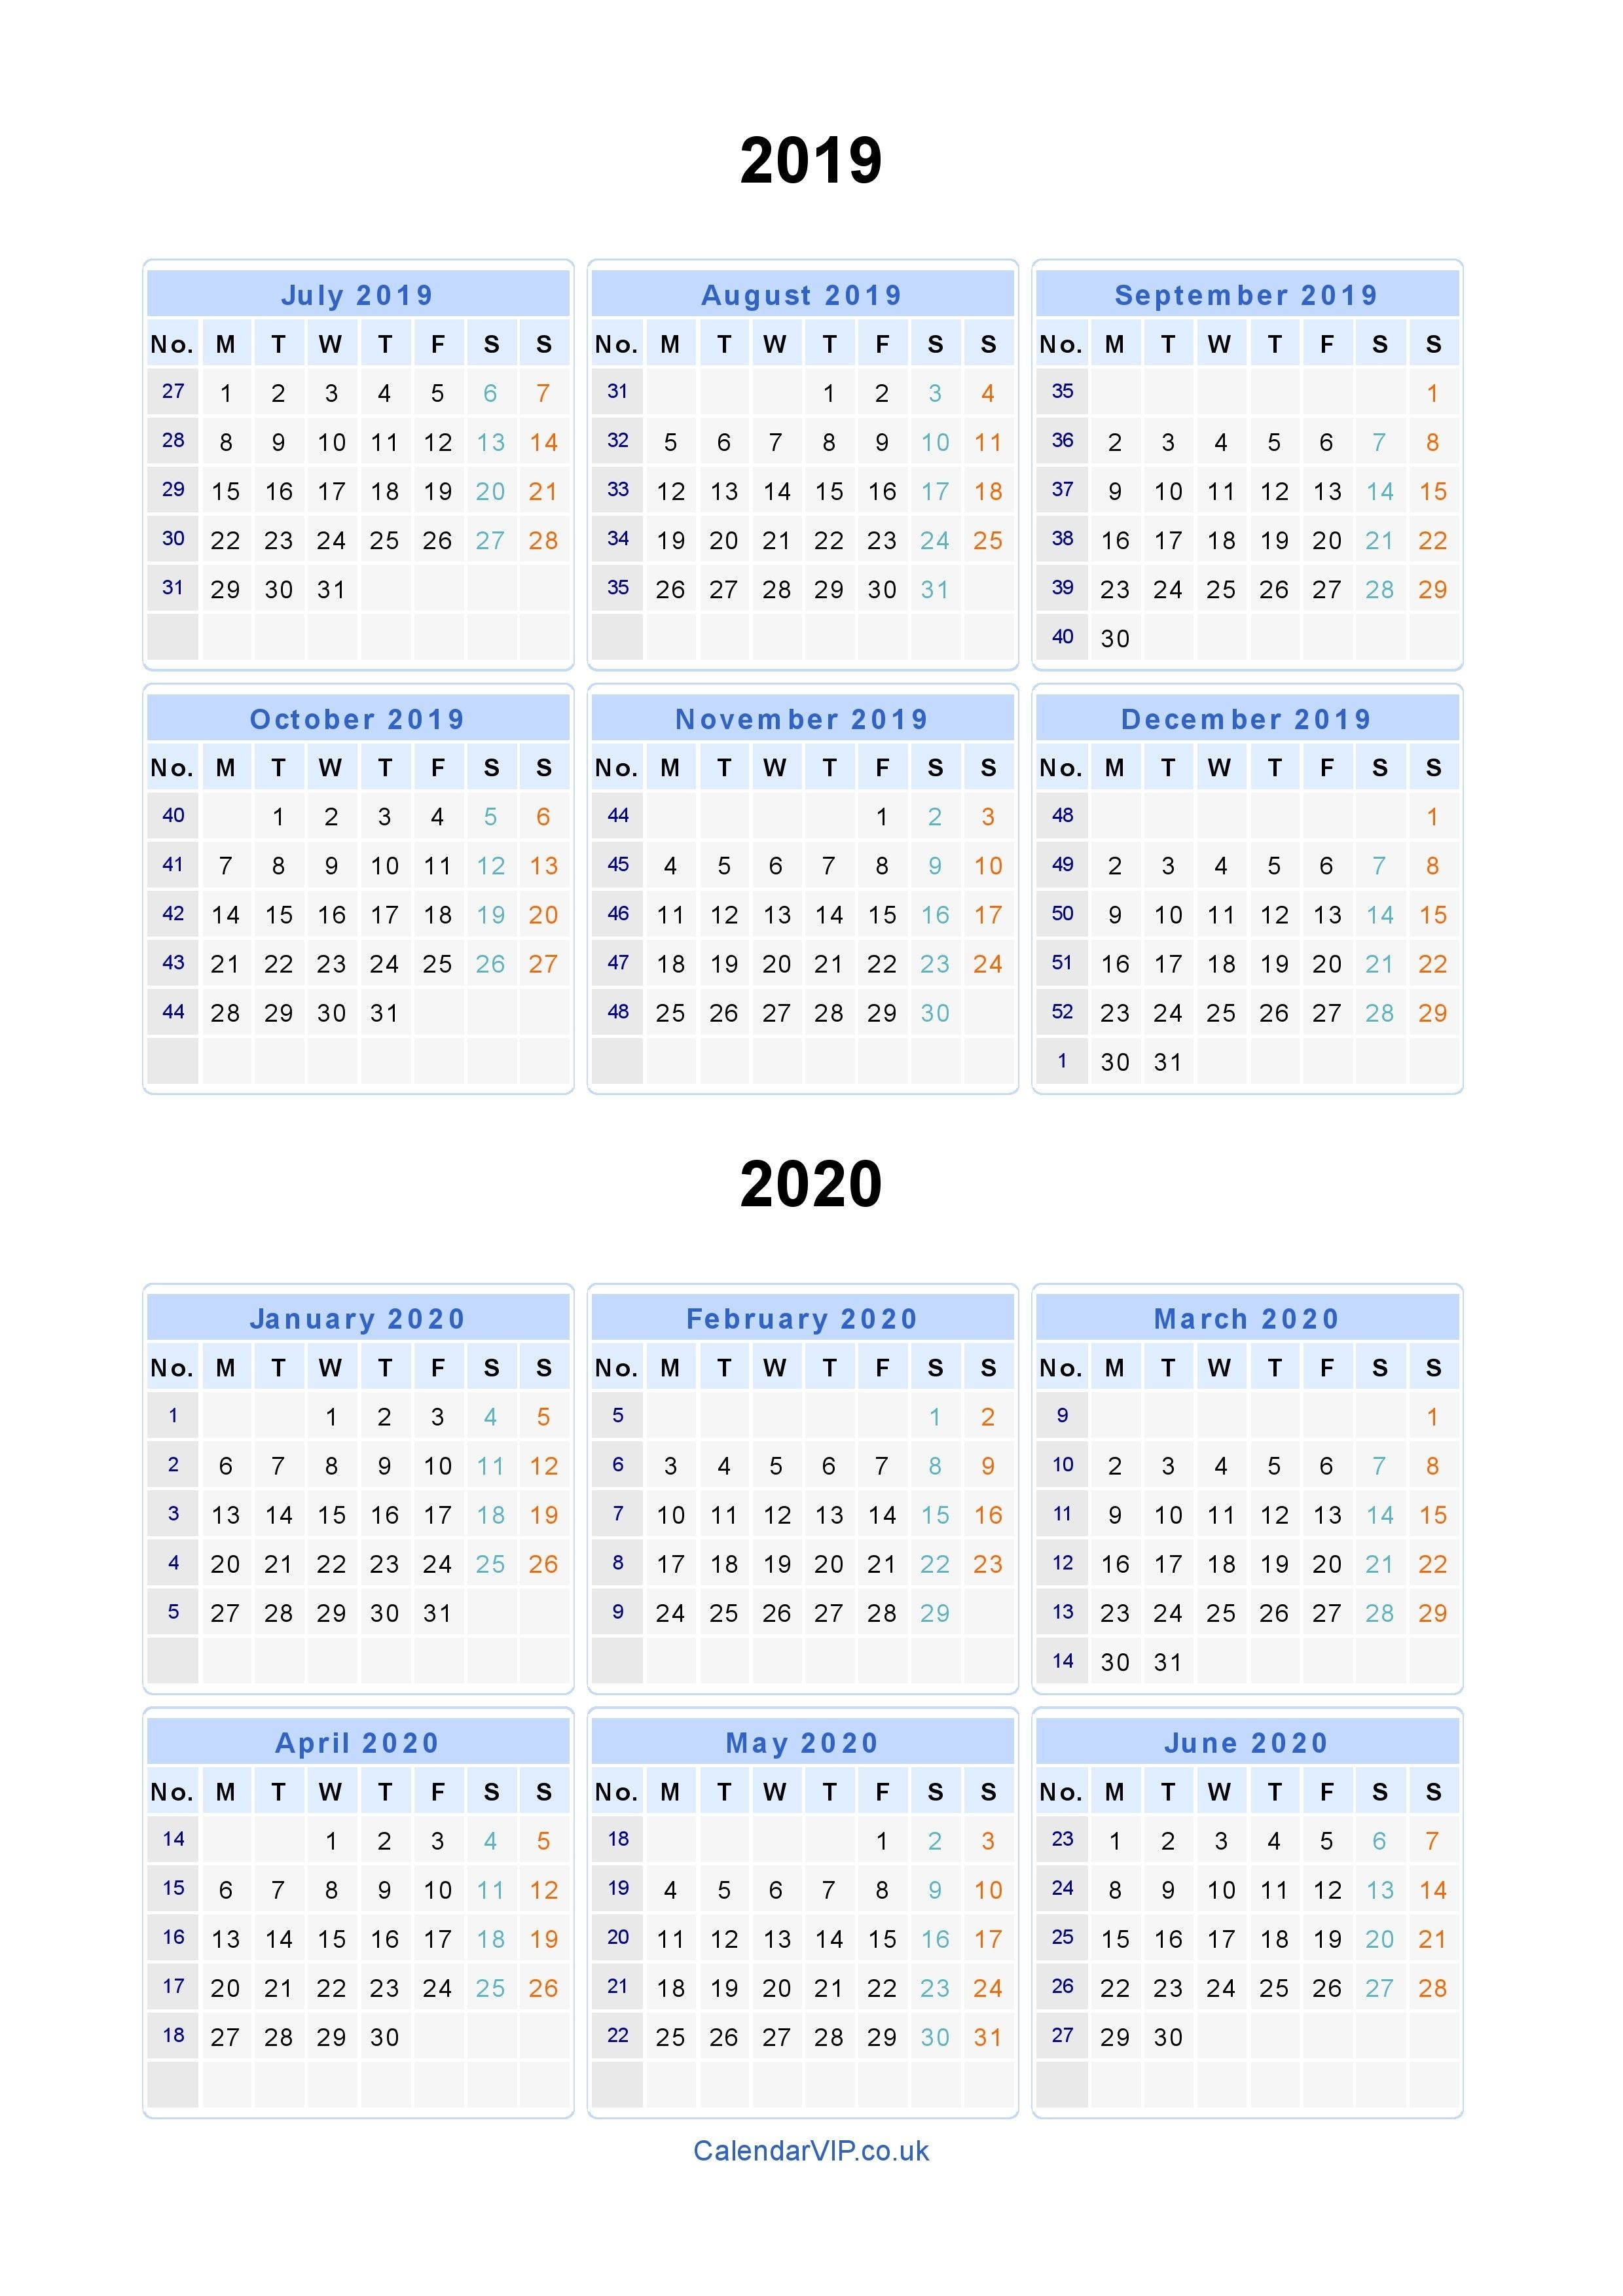 Split Year Calendars 2019 2020 - Calendar From July 2019 To June regarding Printable Calendar 2019 2020 Write On